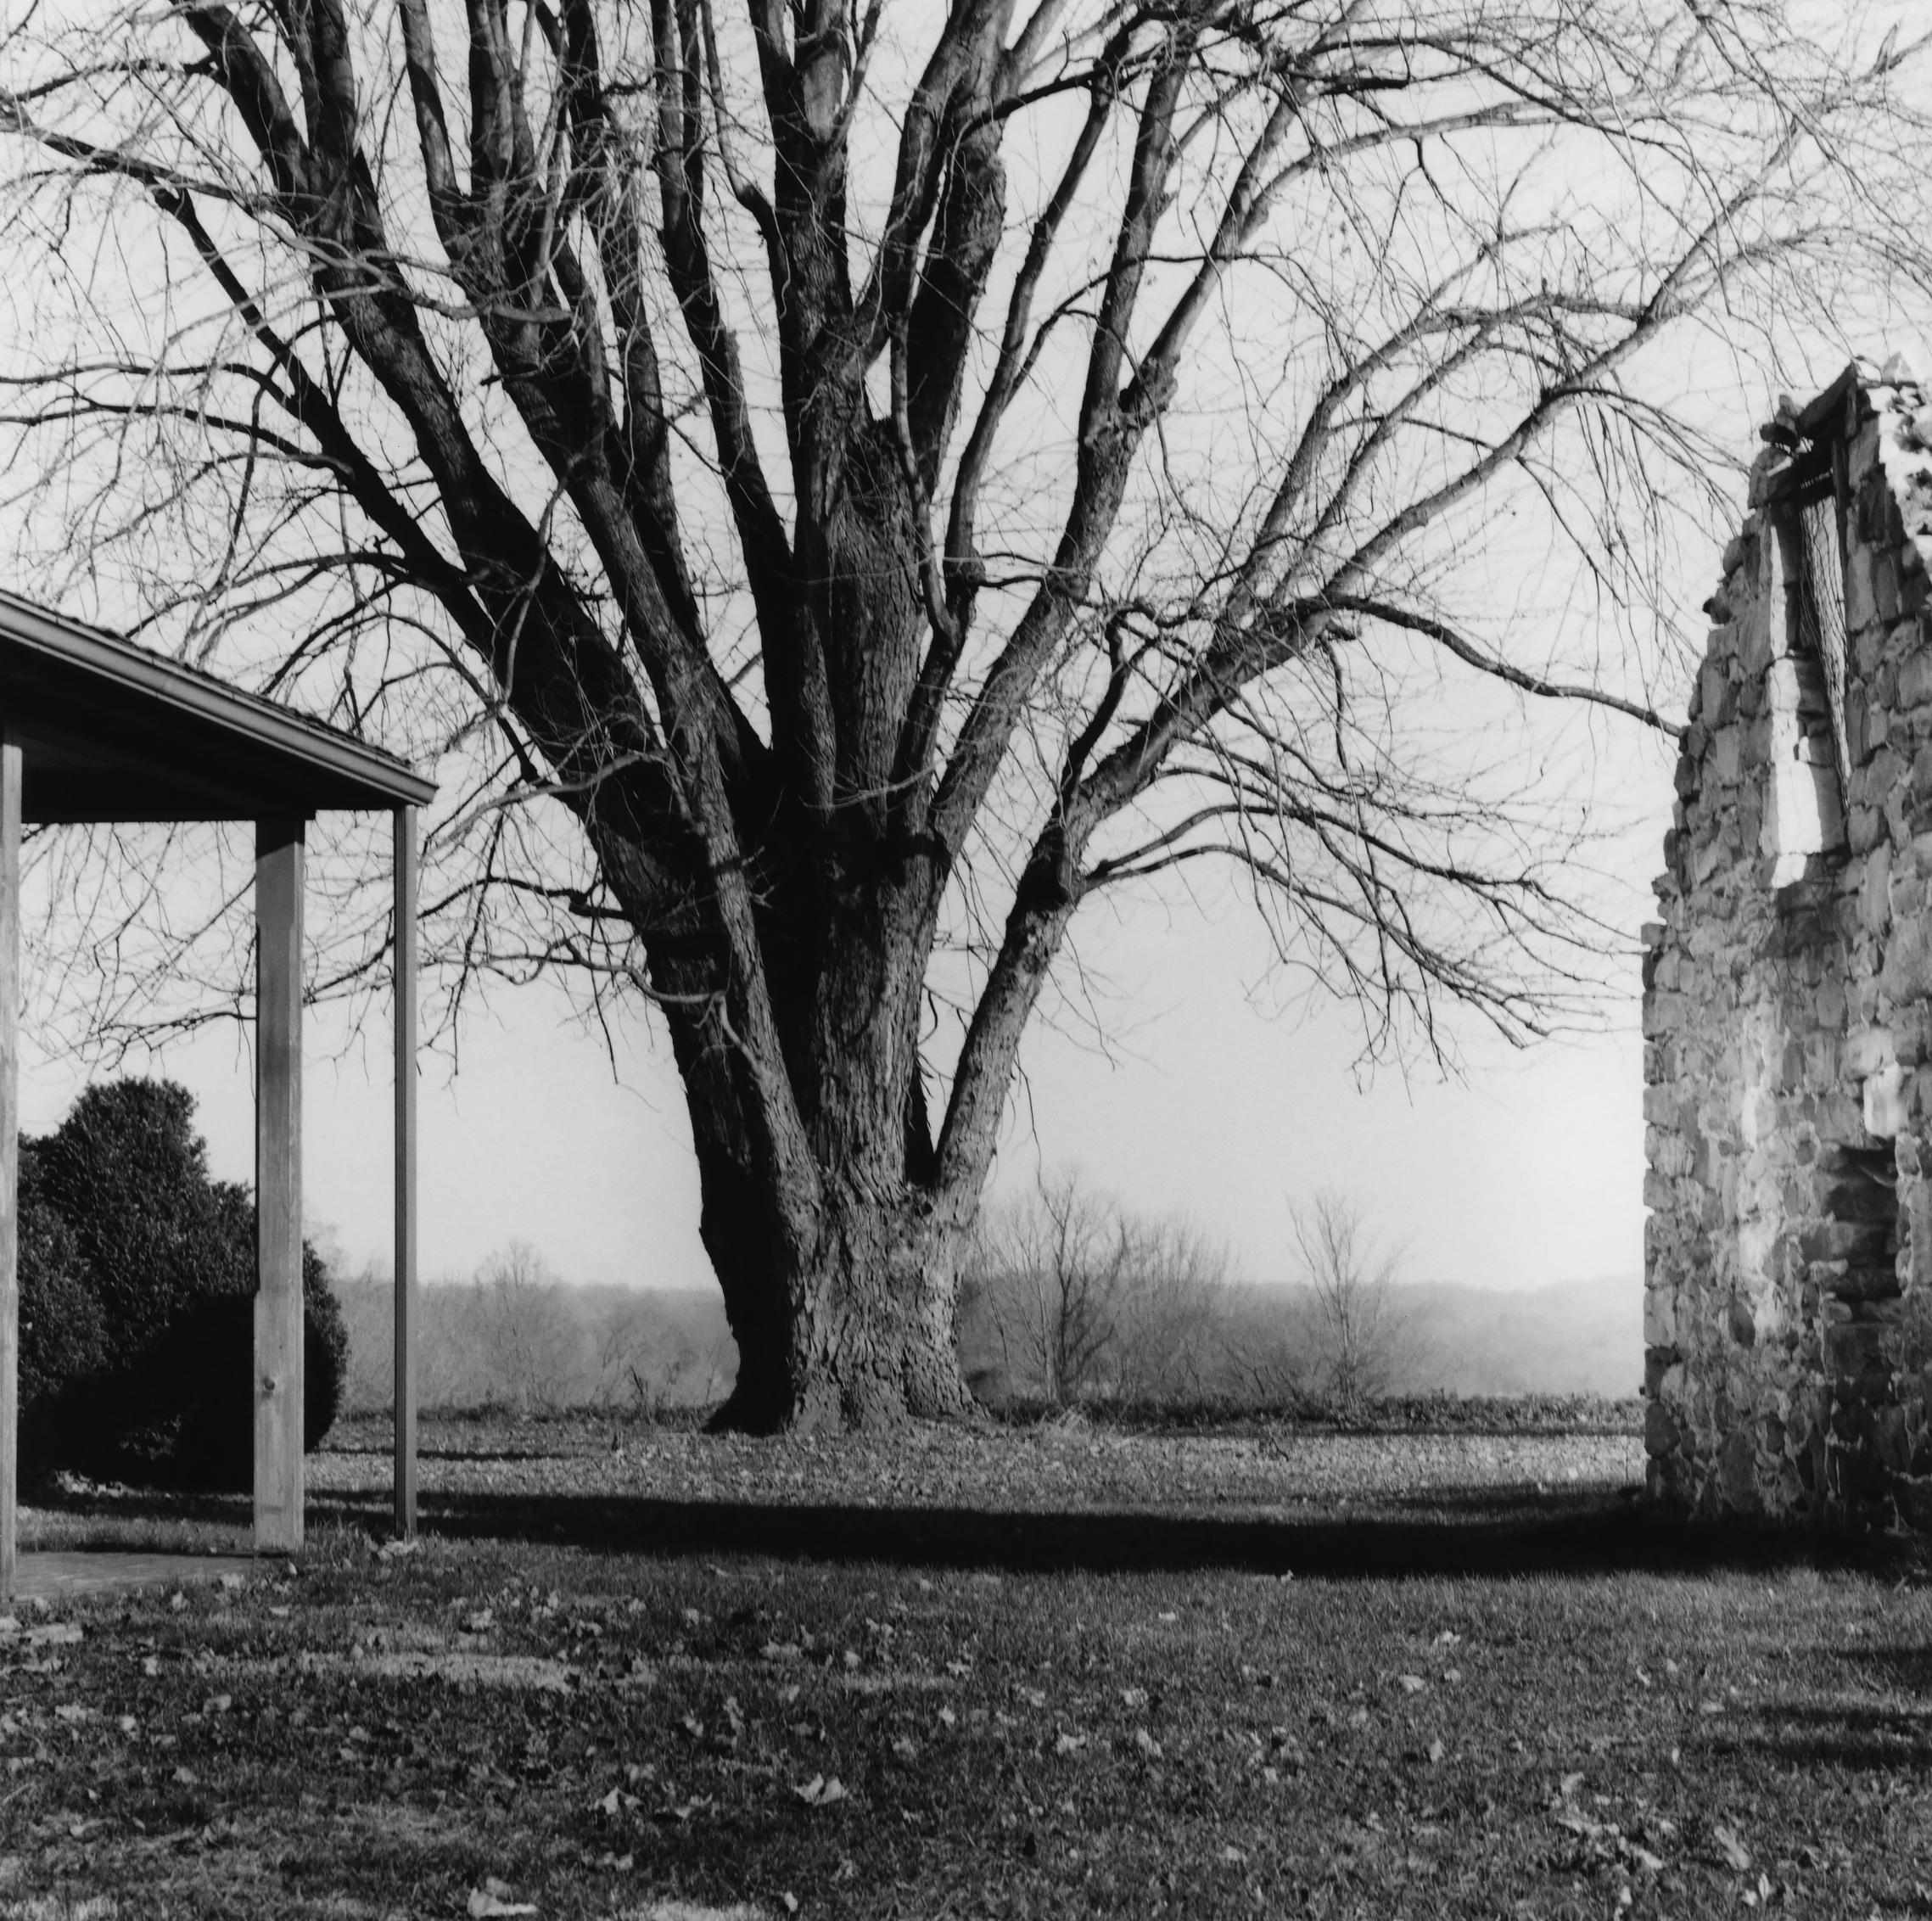 Wagontown Inn, House and Ruins of Barn, Wagontown, Pennsylvania, 1998